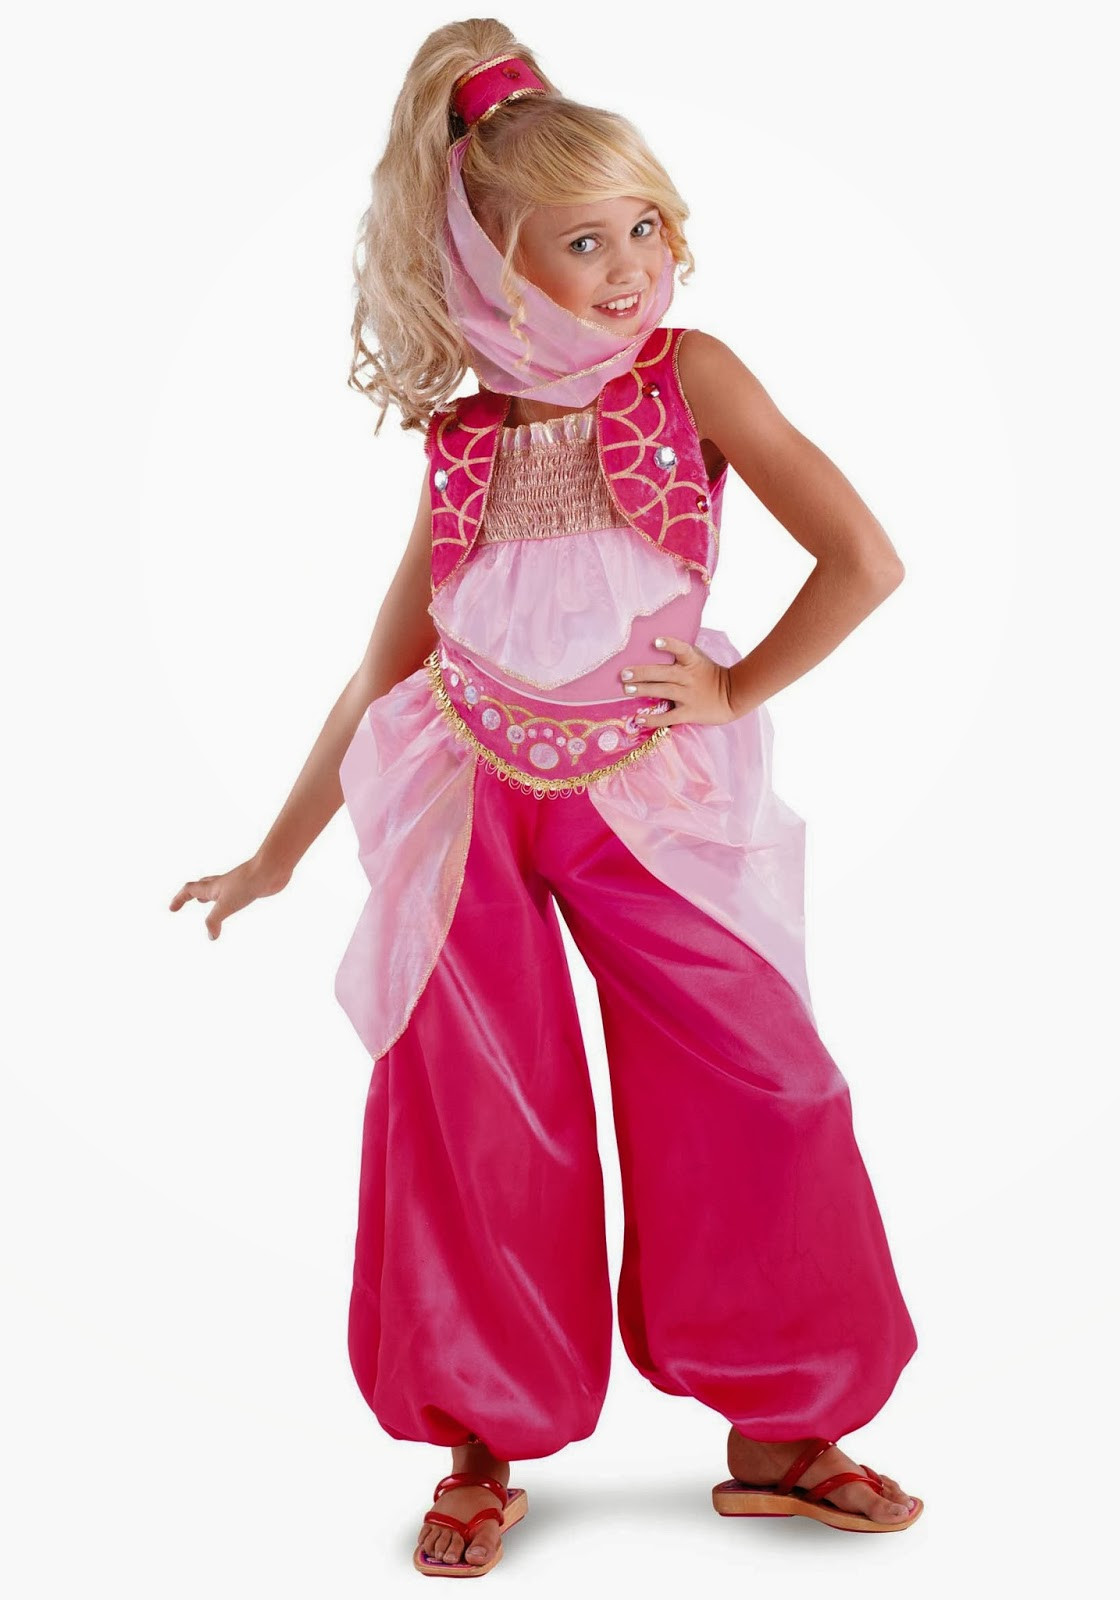 Genie Costume DIY  Cute Scrap Layout By Evelyn Regly